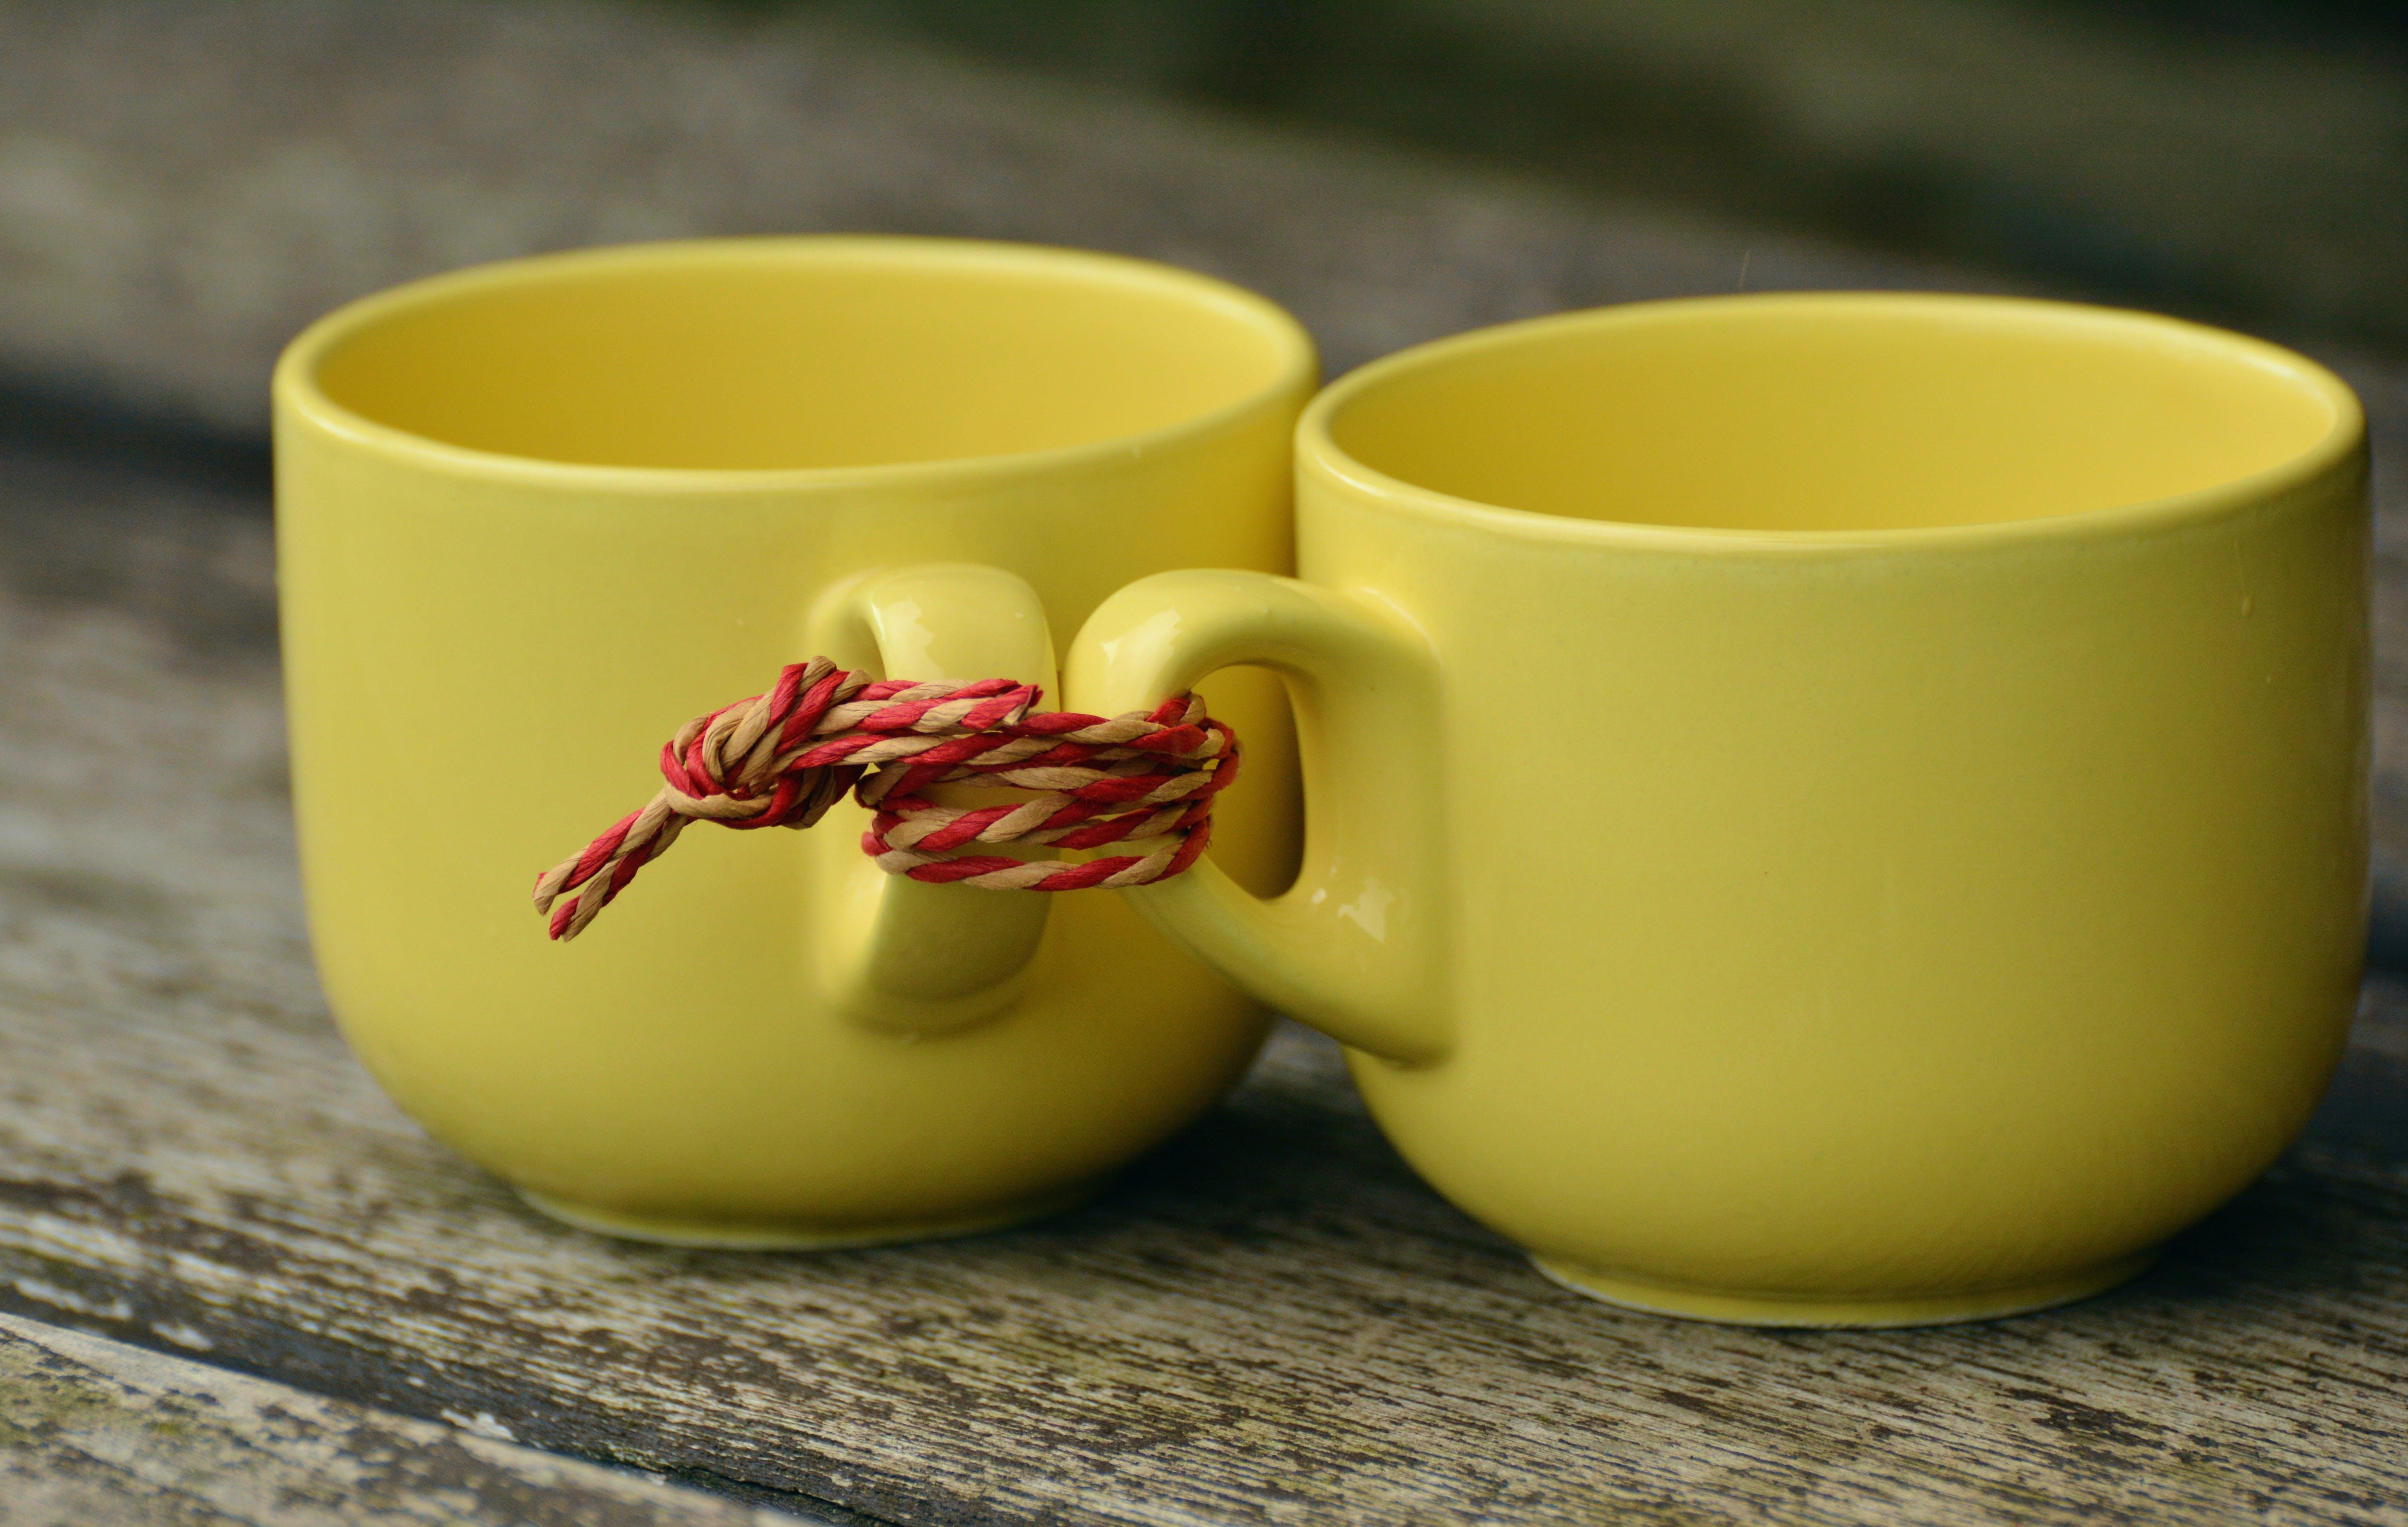 ceramic, cups, knot